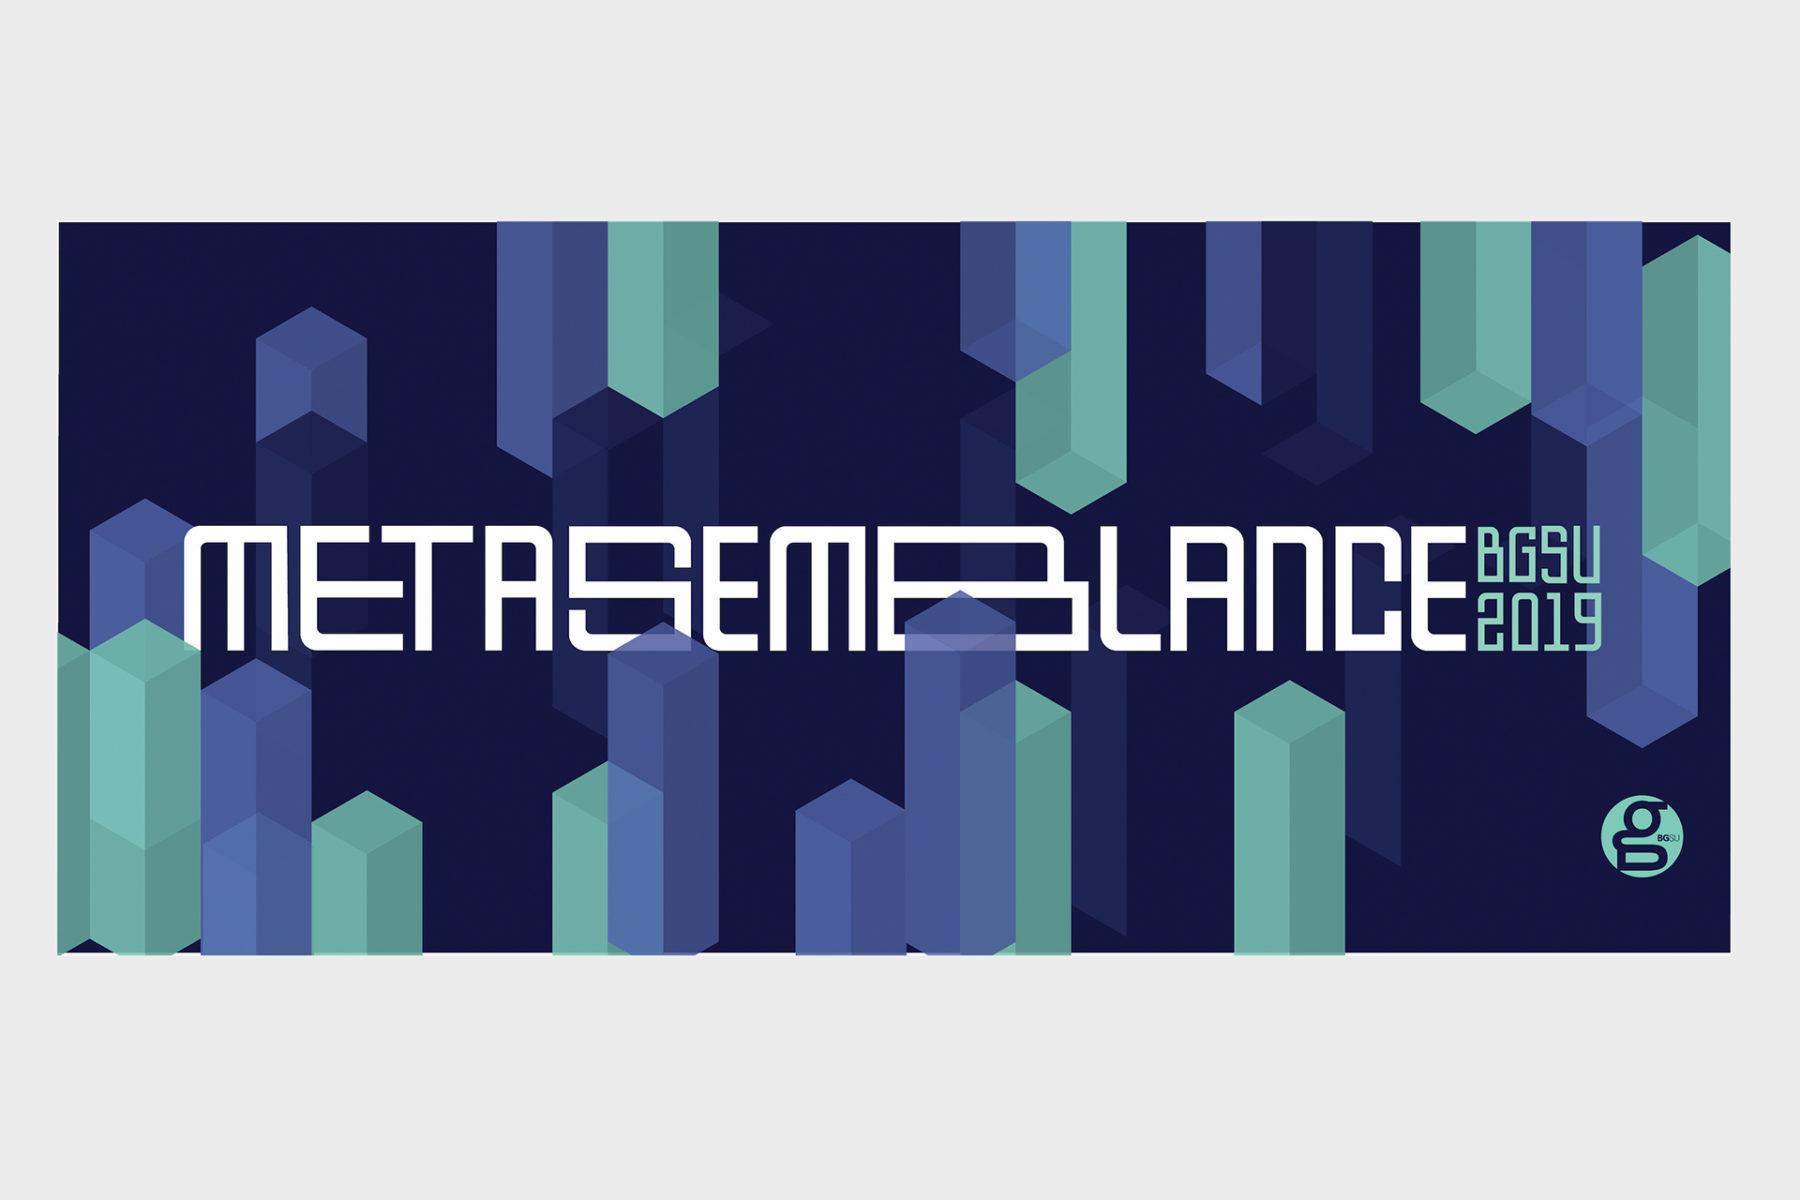 Metasemblance: 2019 Senior Show